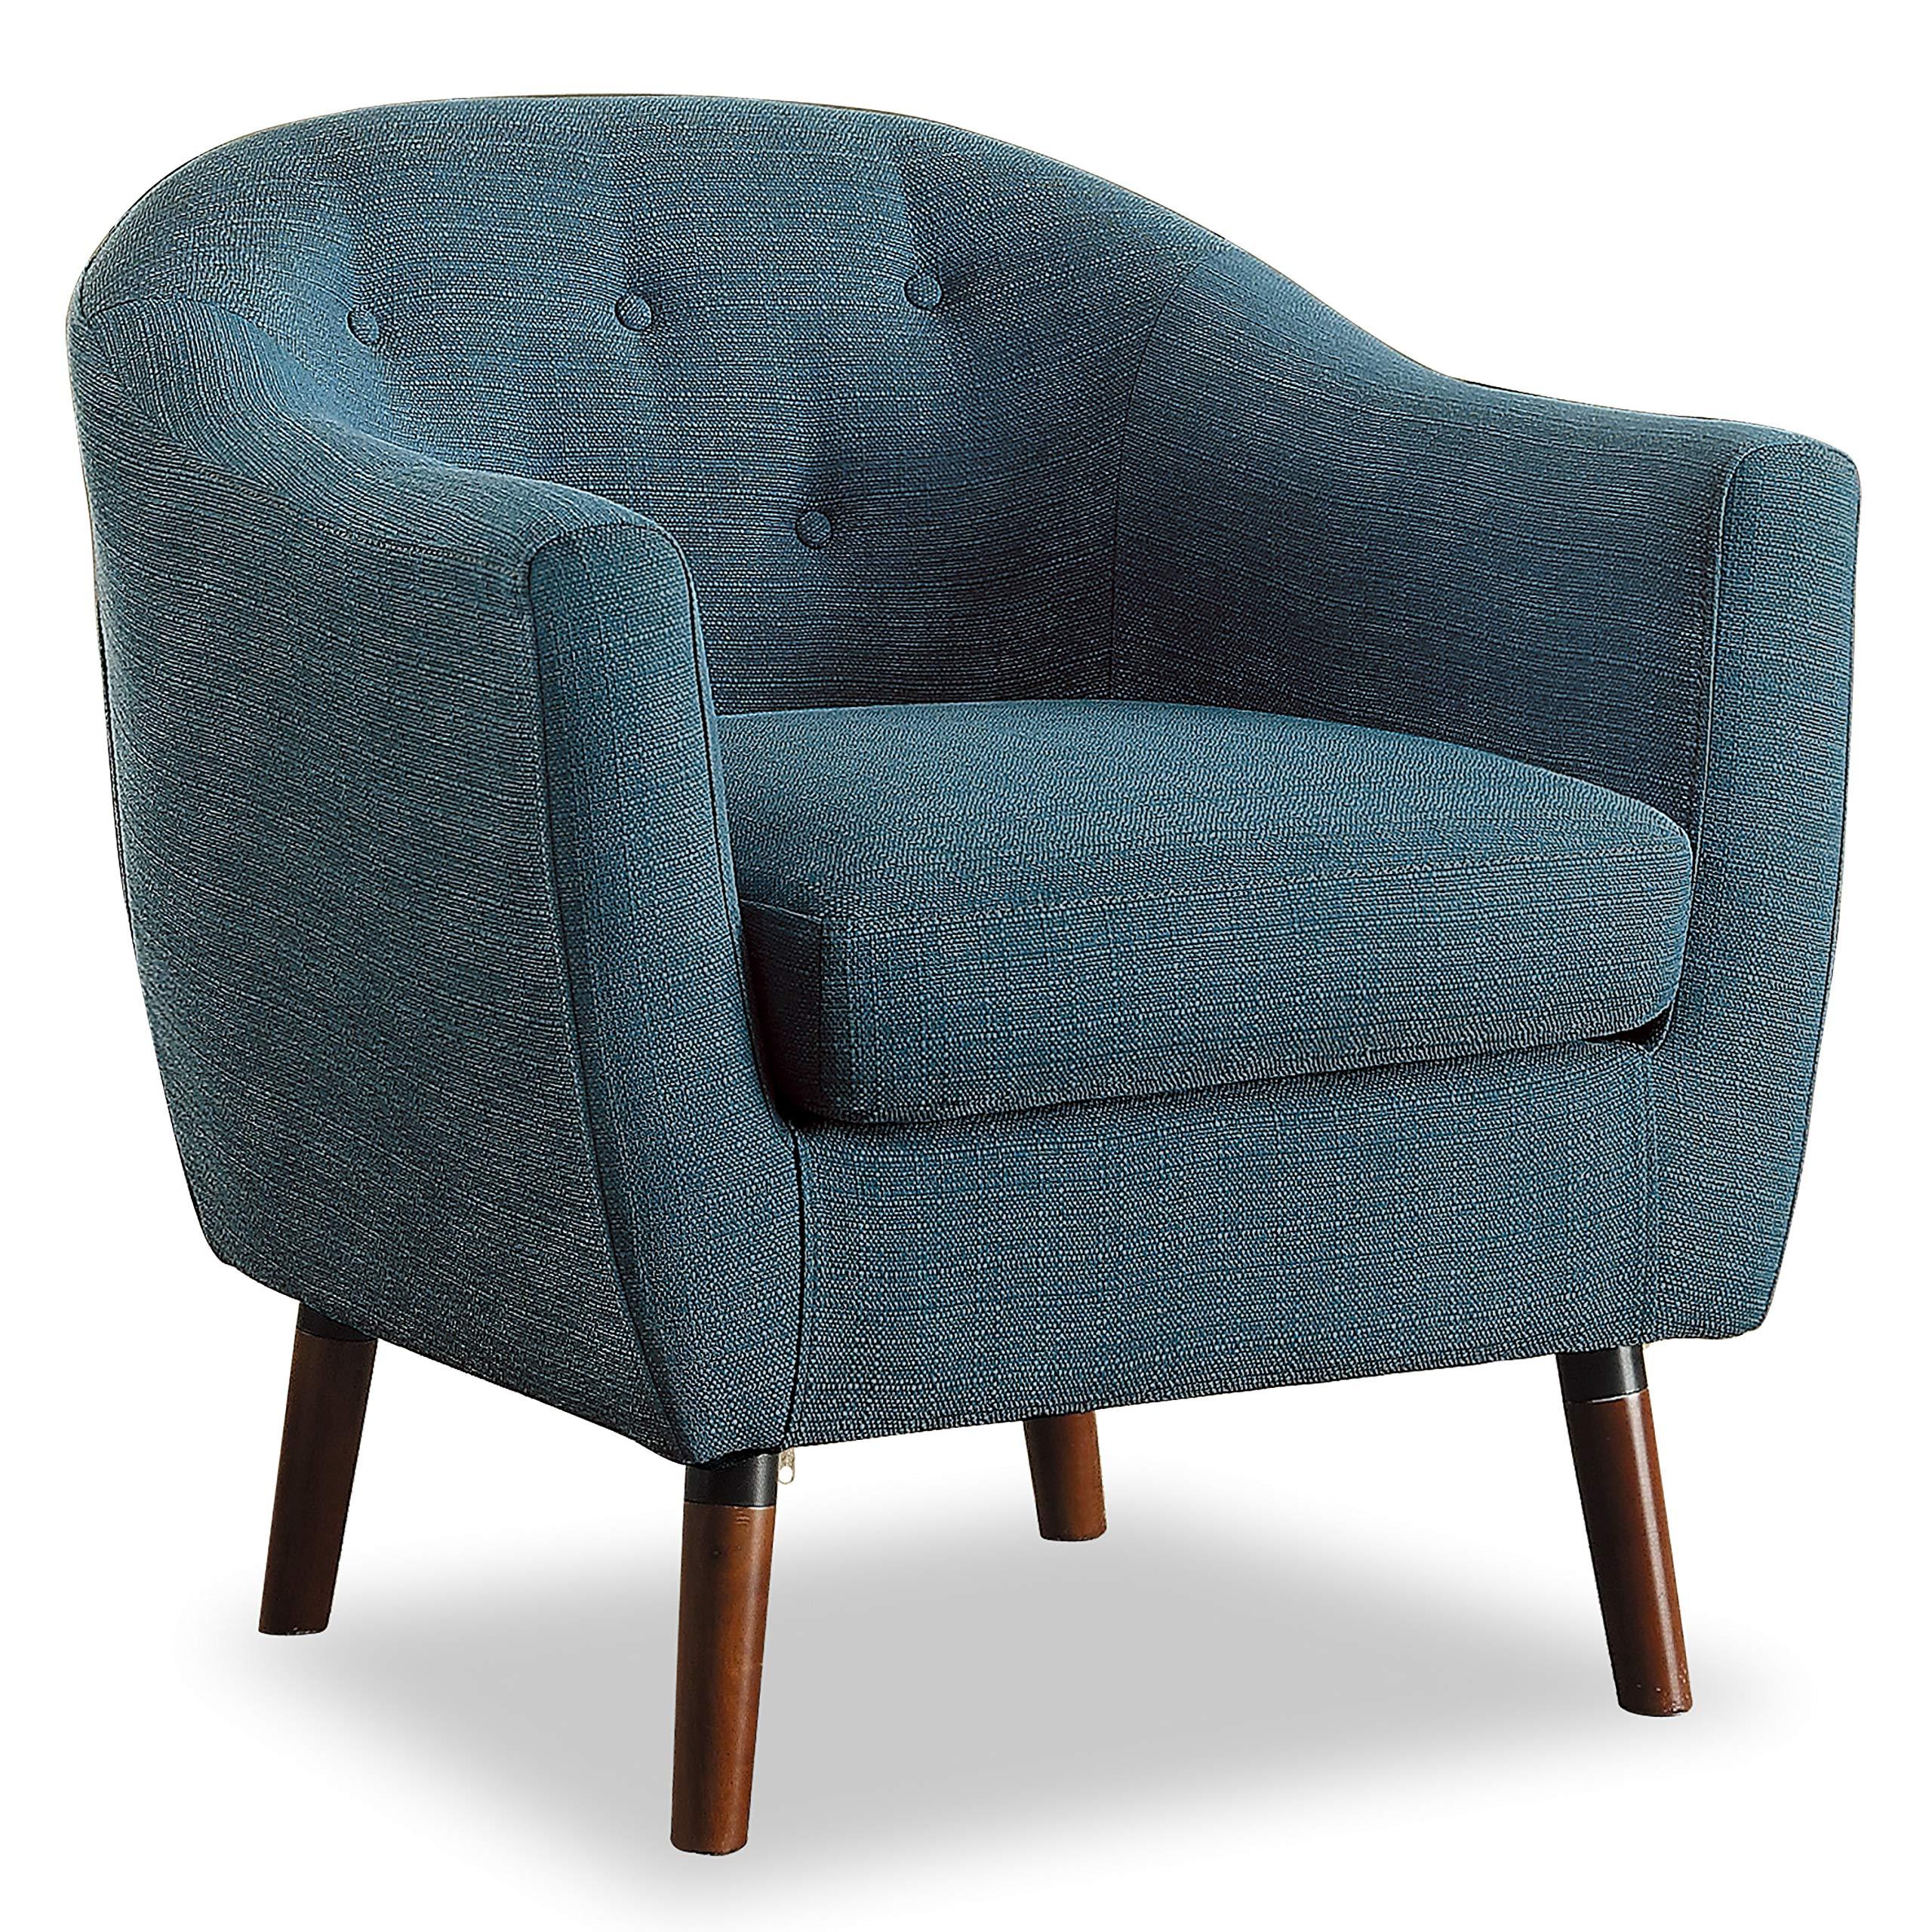 Homelegance Lucille Fabric Barrel Chair, Blue by Homelegance